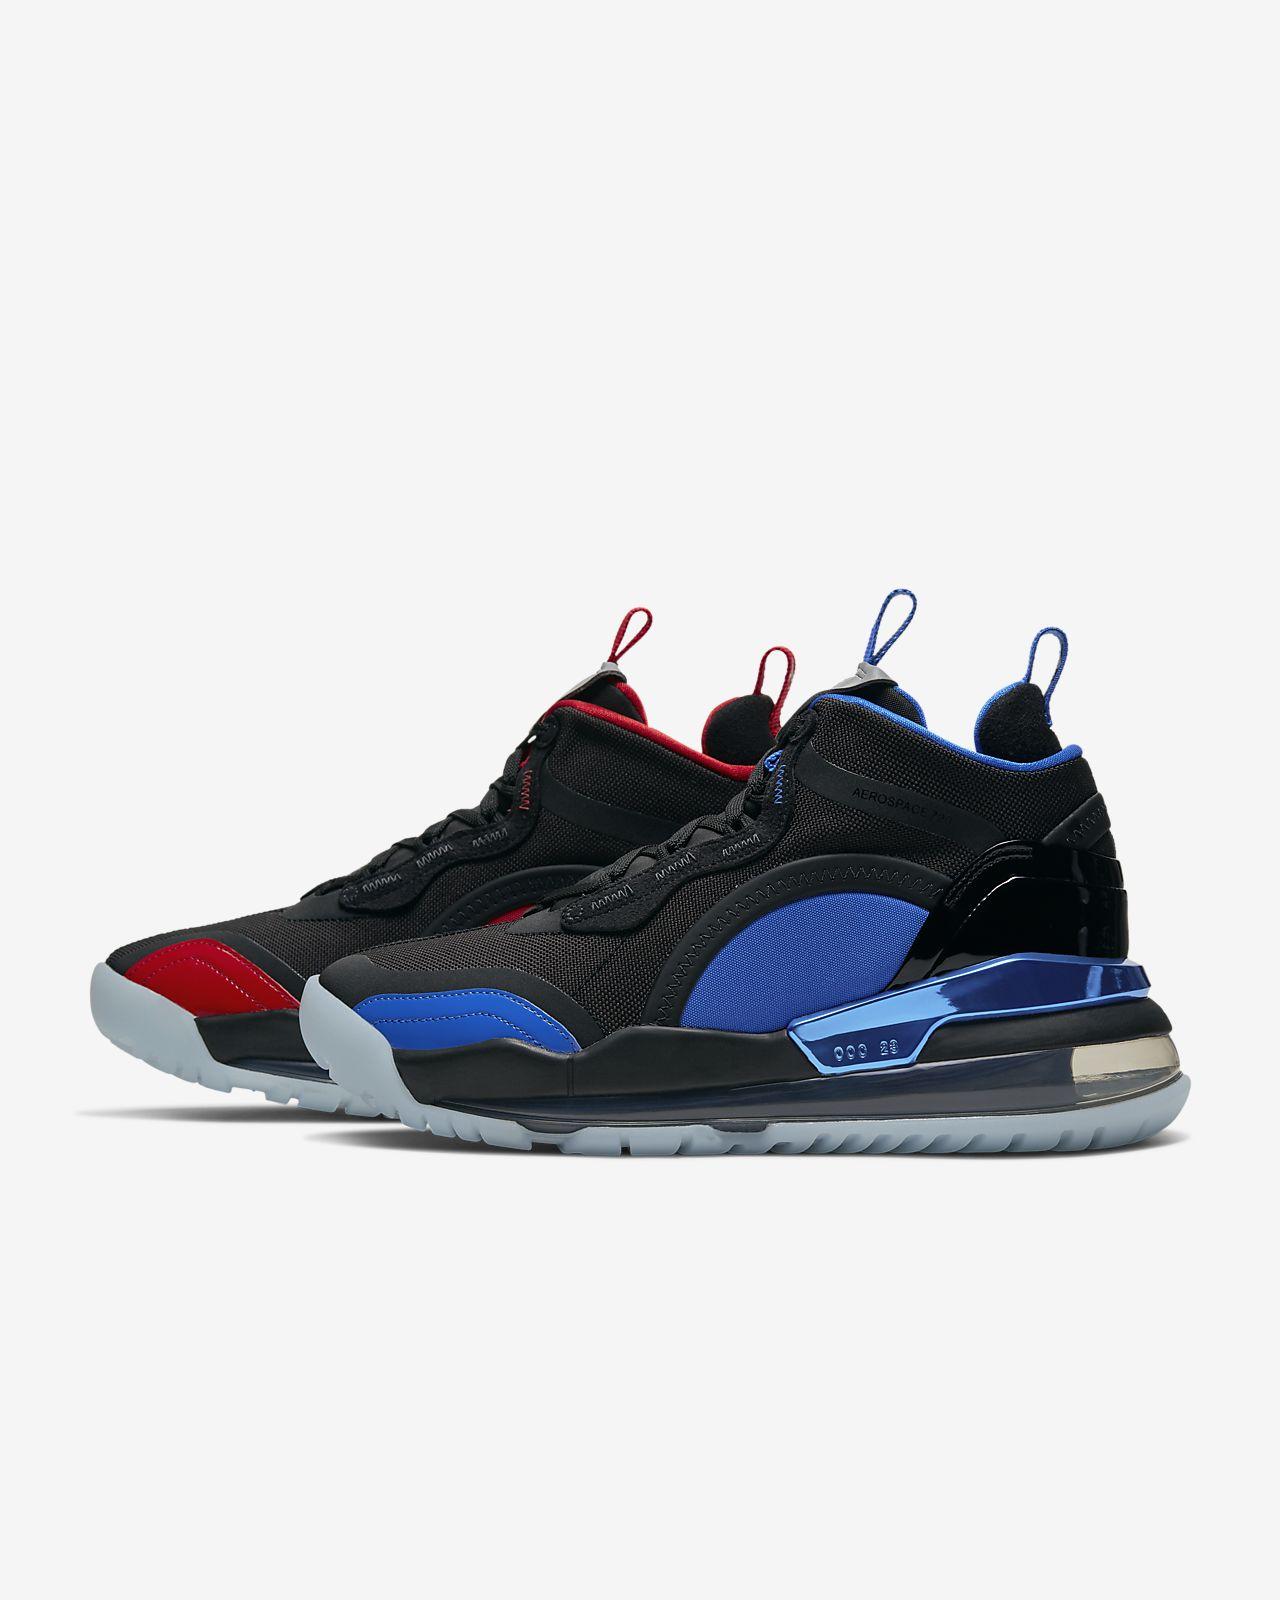 Nike Wmns Air Max 1 Ultra Lotc QS Chaussure Nike City Collection Pour Femme Paris 747105 400 1507081613 Officiel Nike Site! Chaussures Tn